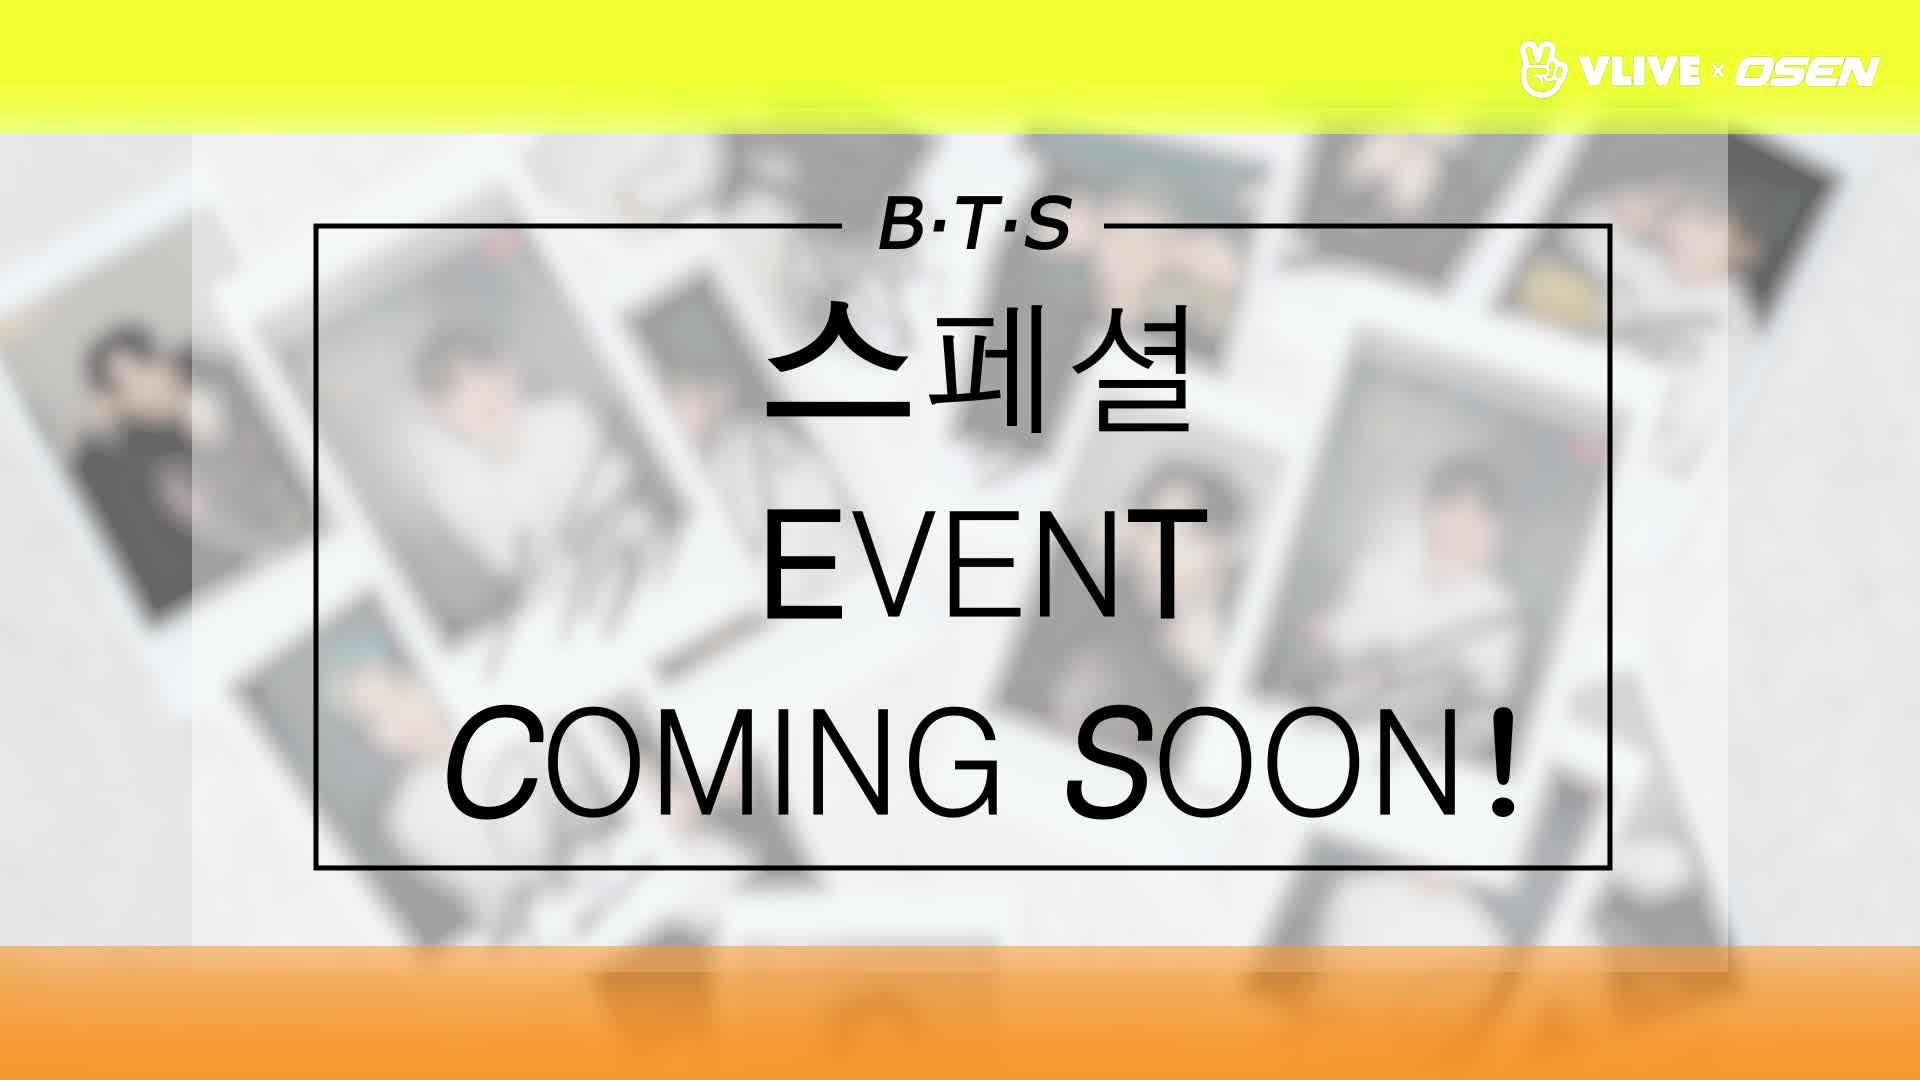 BTS 방탄소년단's 깜짝 선물